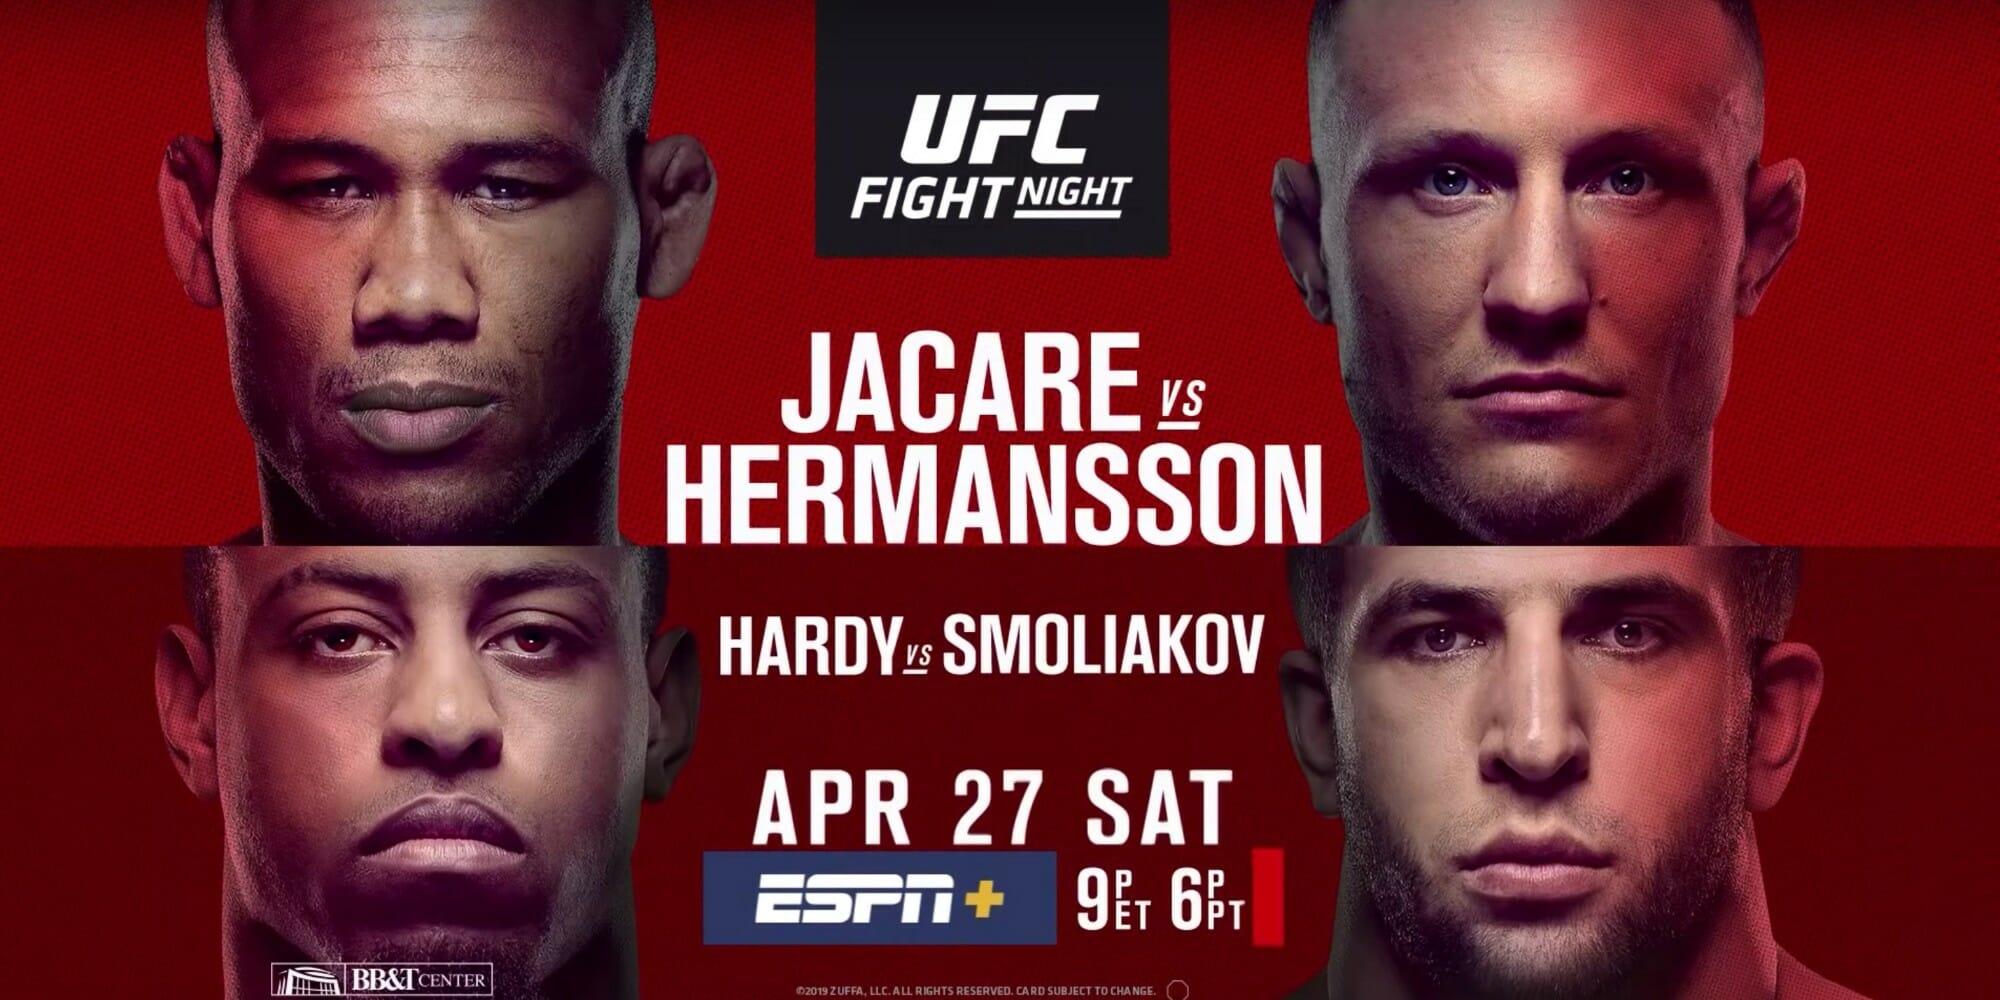 ufc fight night 150 live stream free